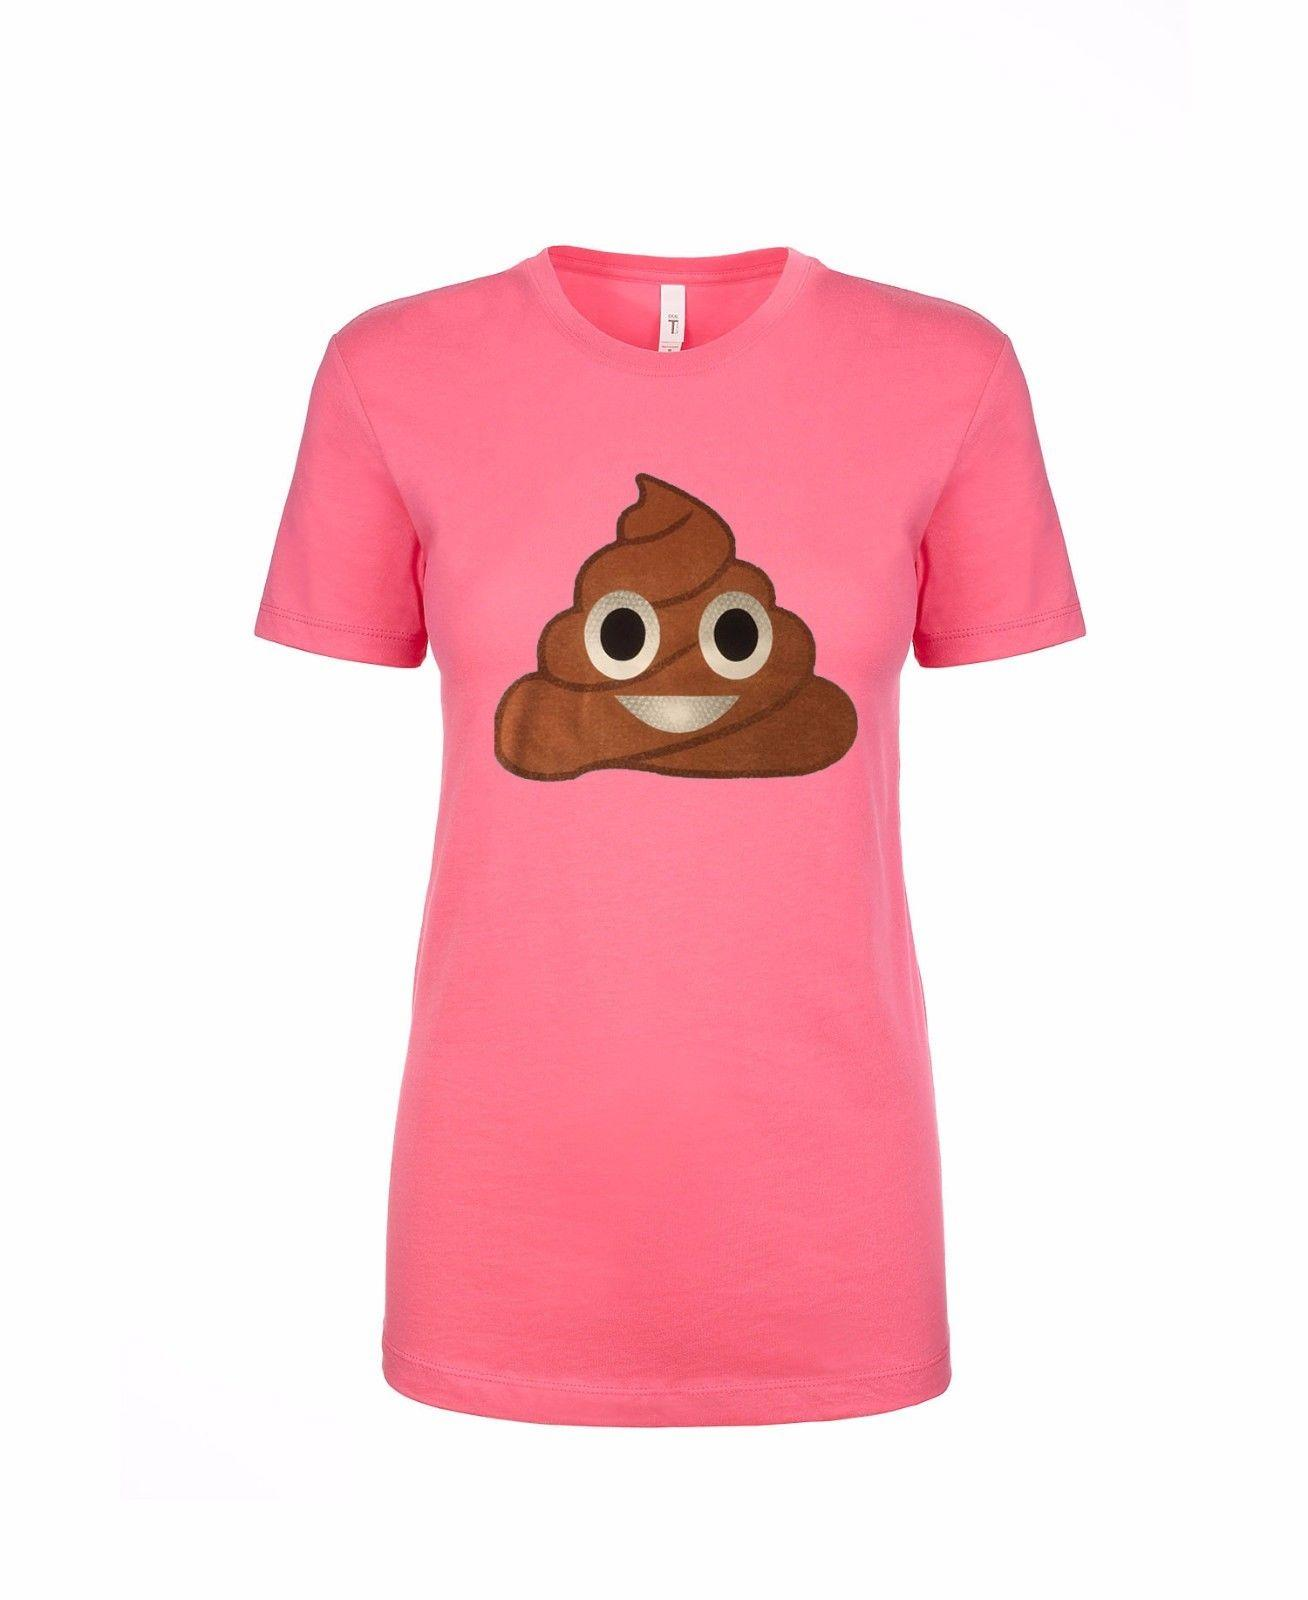 a864b7547a EMOJI WOMEN S T-SHIRT POOP Funny free shipping Unisex Casual tee gift